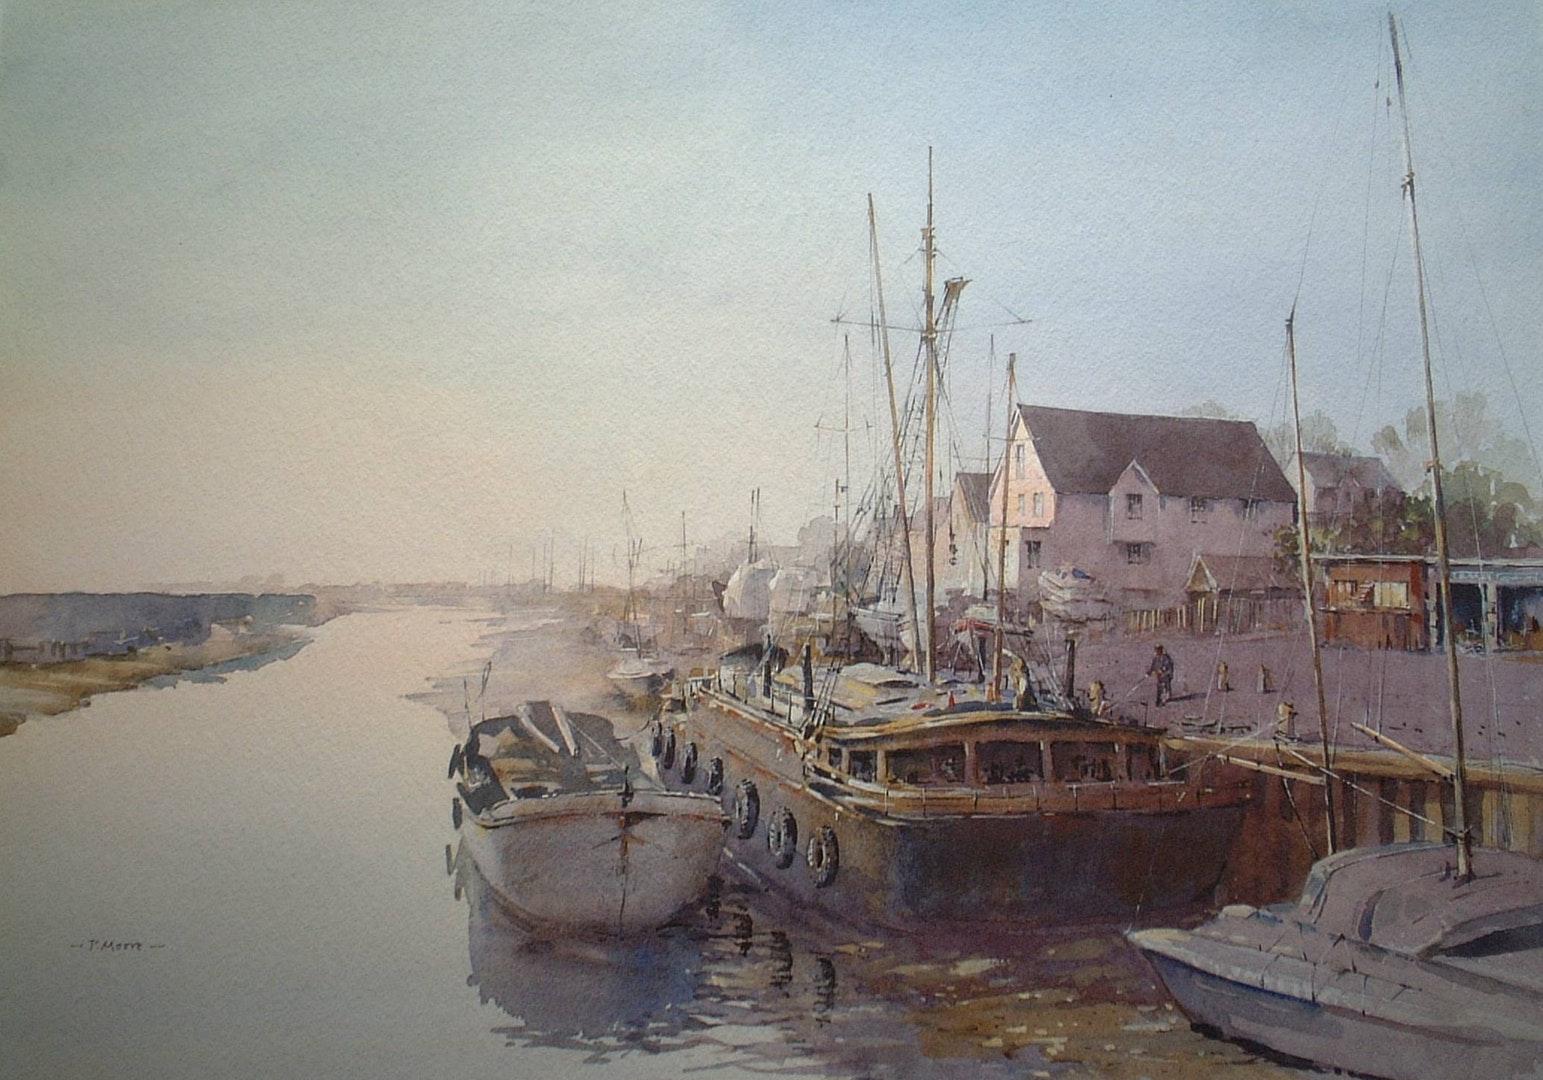 Patsy Moore  Dawn Light at Maldon  Watercolour, 56 x 43 cm  http://www.patsymoore.co.uk